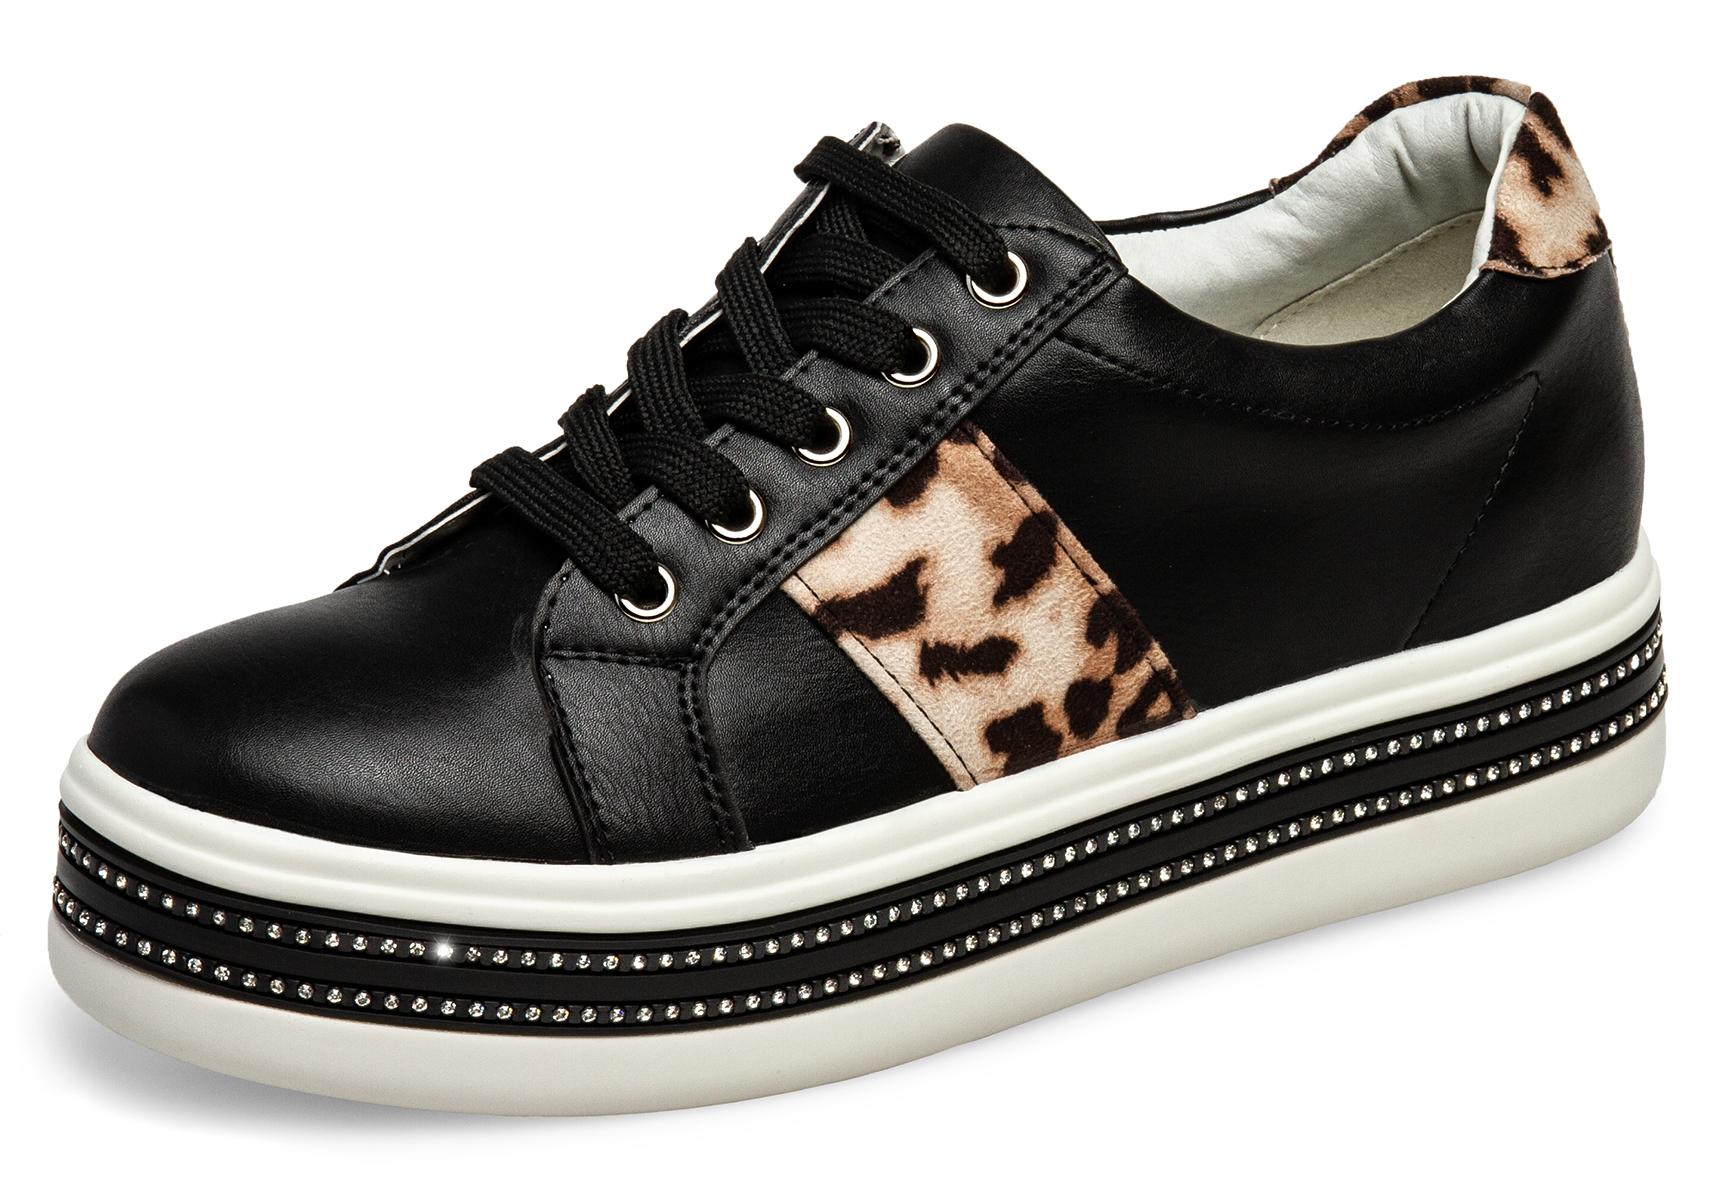 wholesale dealer 711cc 2f3c2 Caspar SBO095 Damen Glitzer Strass Leo Plateau Sneaker Low ...